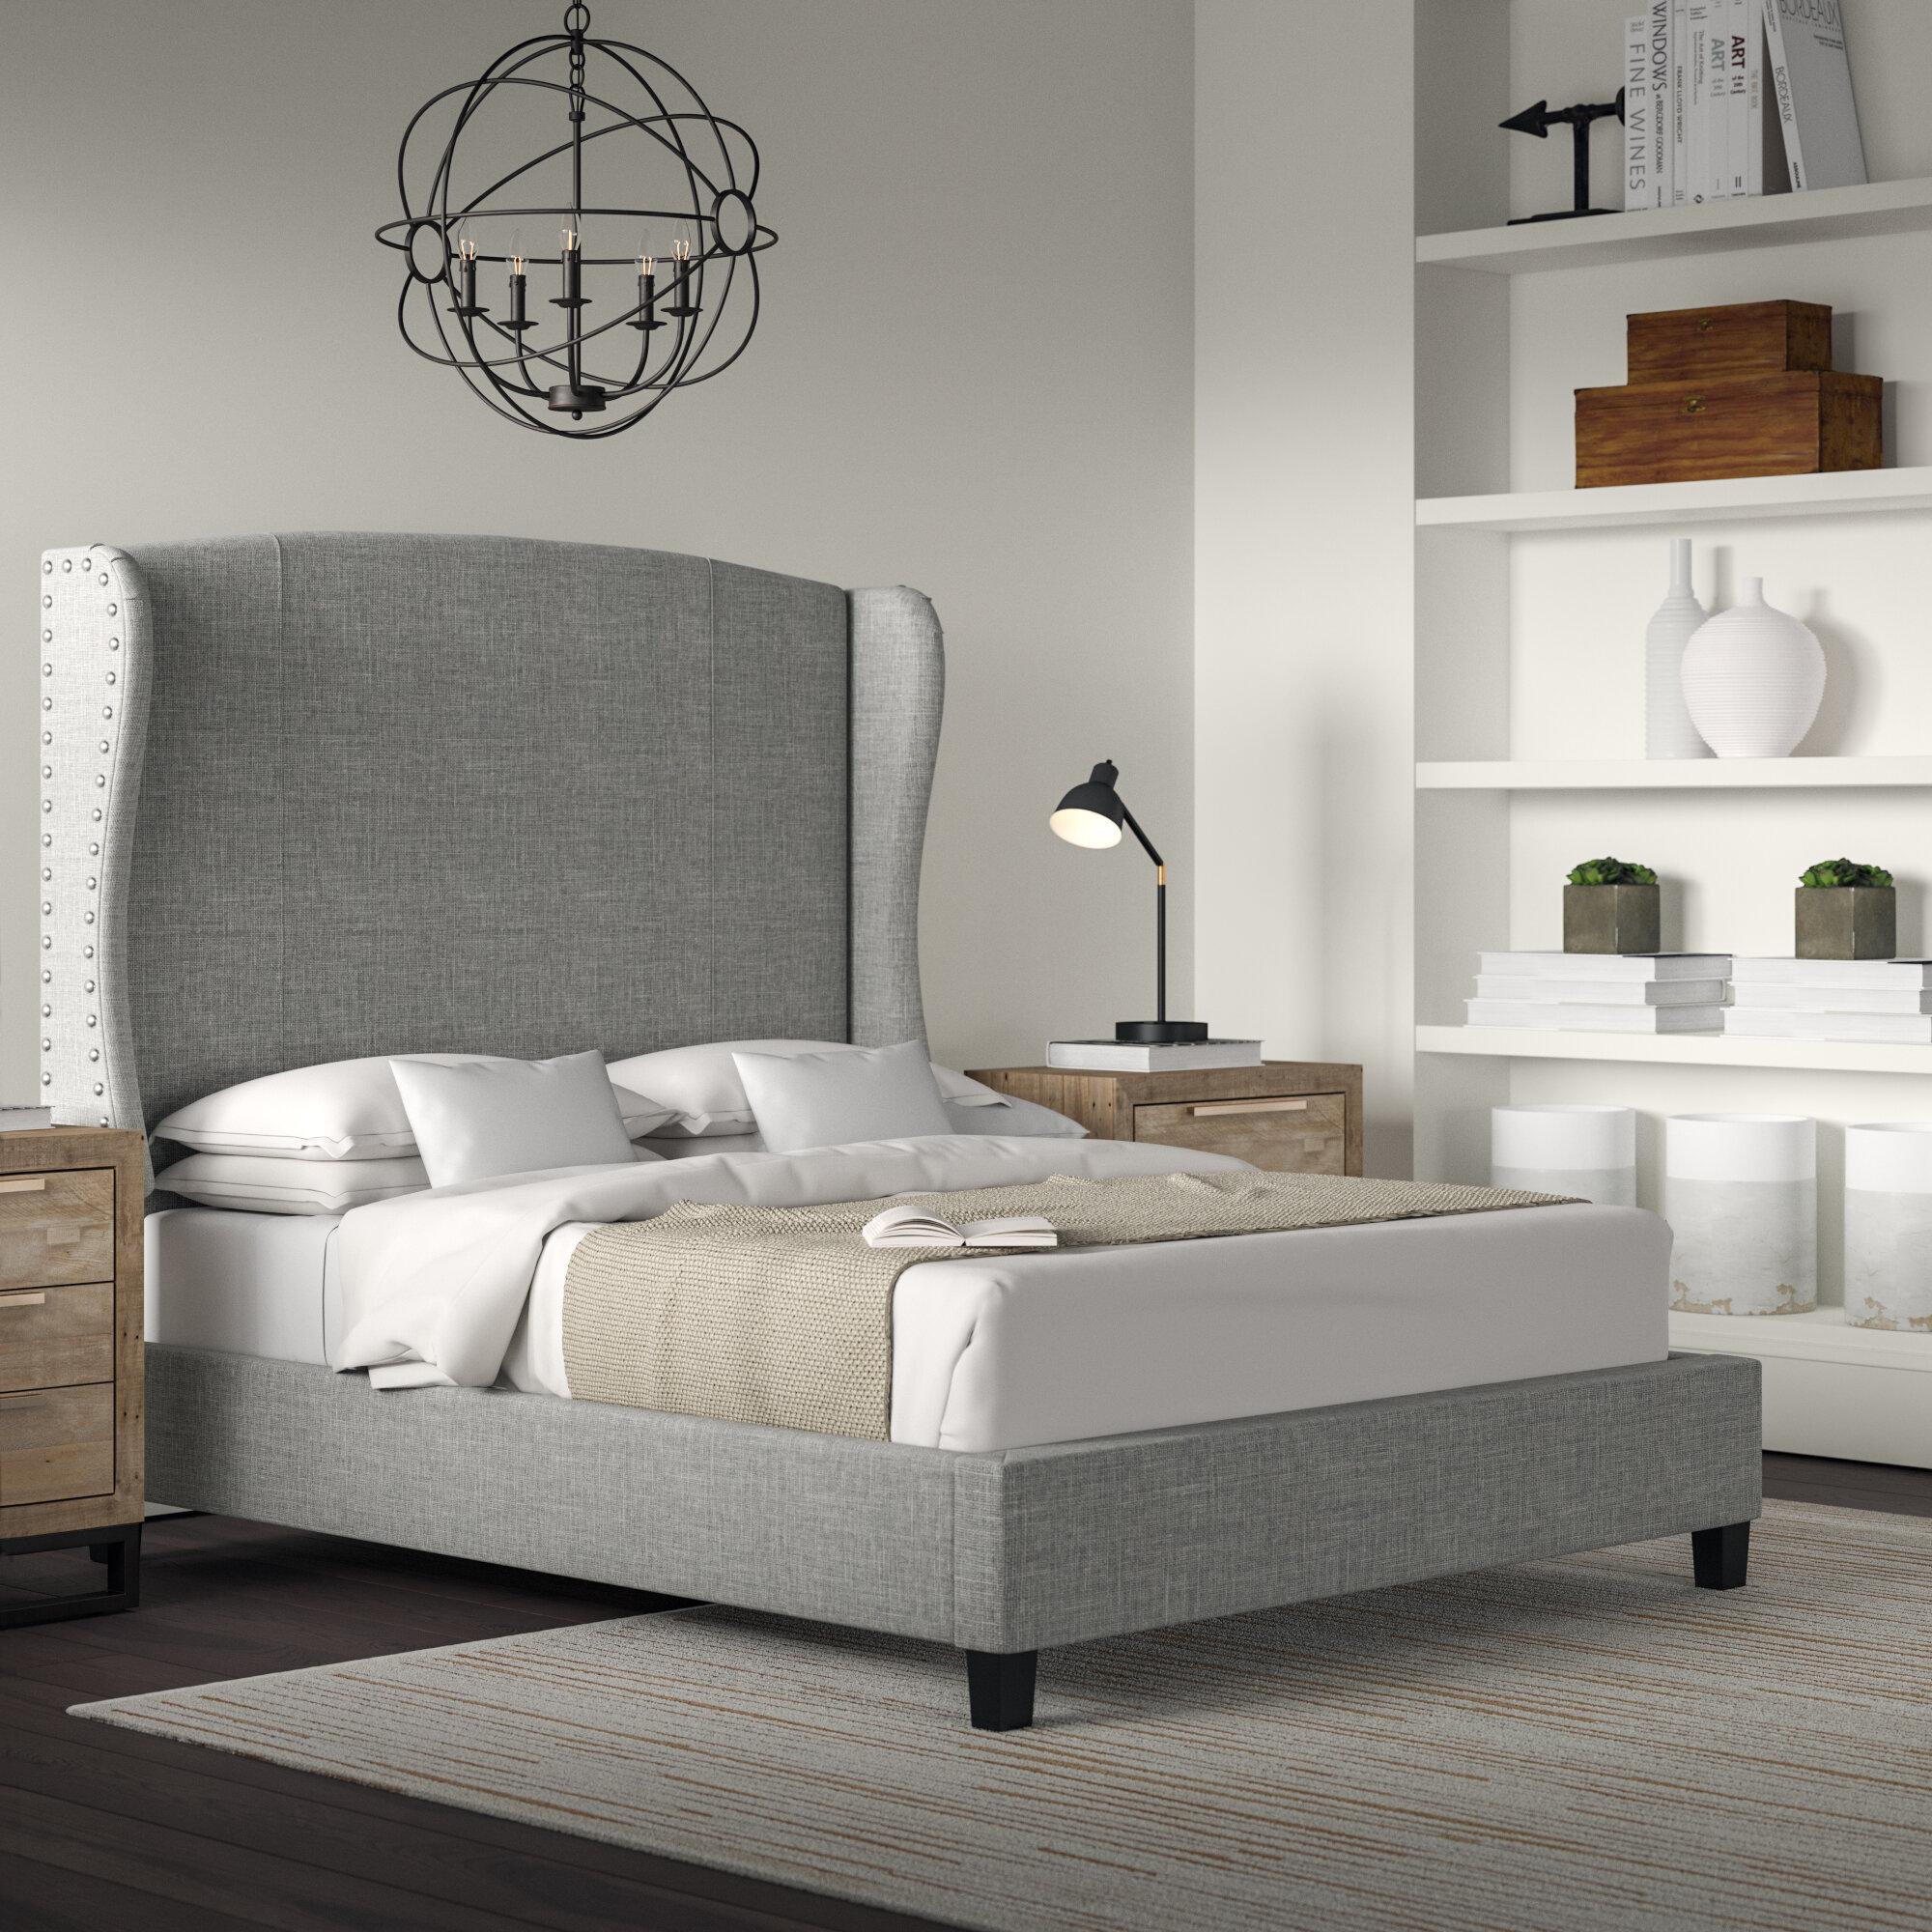 Greyleigh Progreso Upholstered Platform Bed Reviews Wayfair